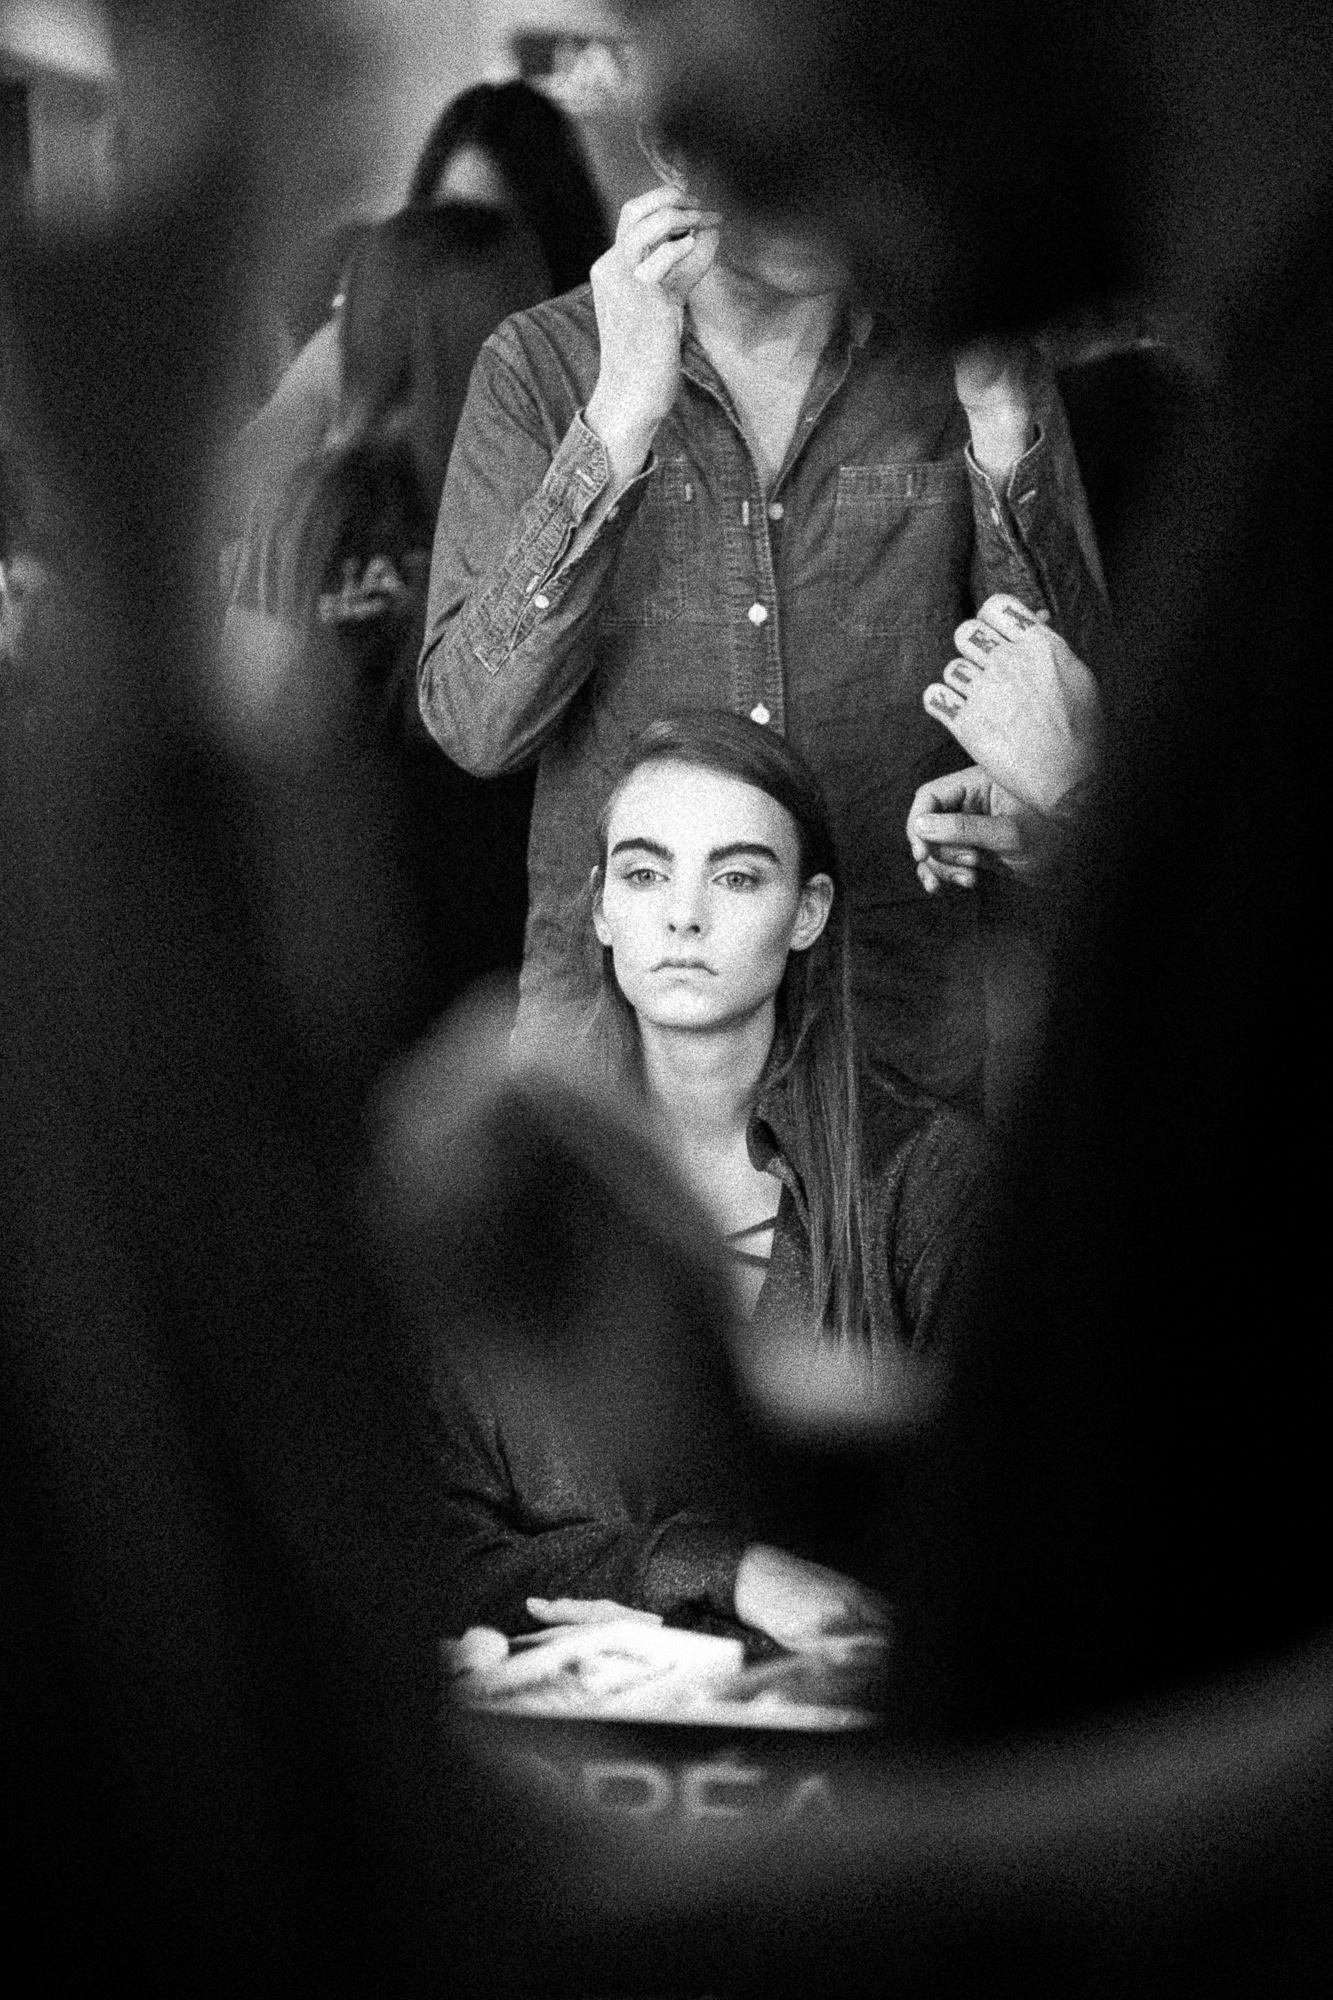 oscar-arribas-beauty-backstage-madrid-fashion-week-cibeles-photography-moda-desfile-fotografo-photographer-portrait-retrato-18__MG_5945.jpg